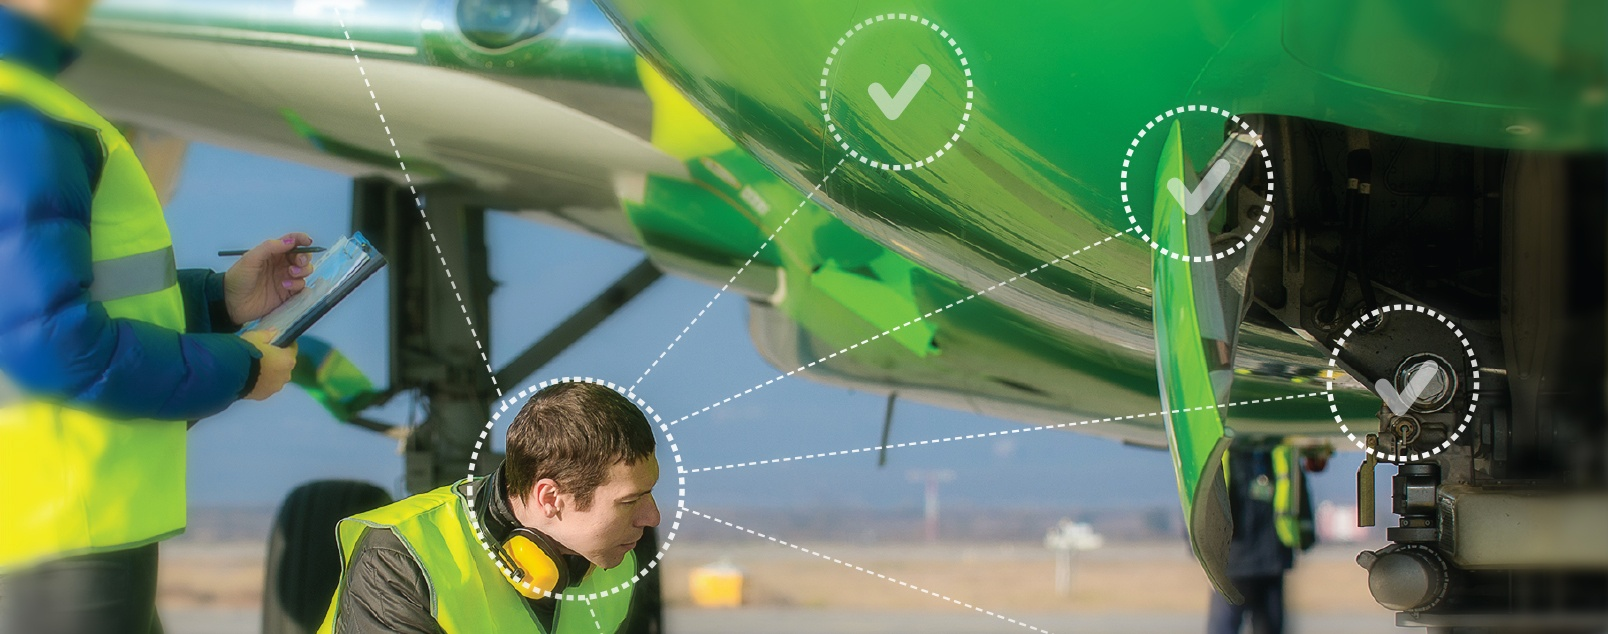 How to prepare for airlines next audit deadline whitepaper background-june2018.jpg